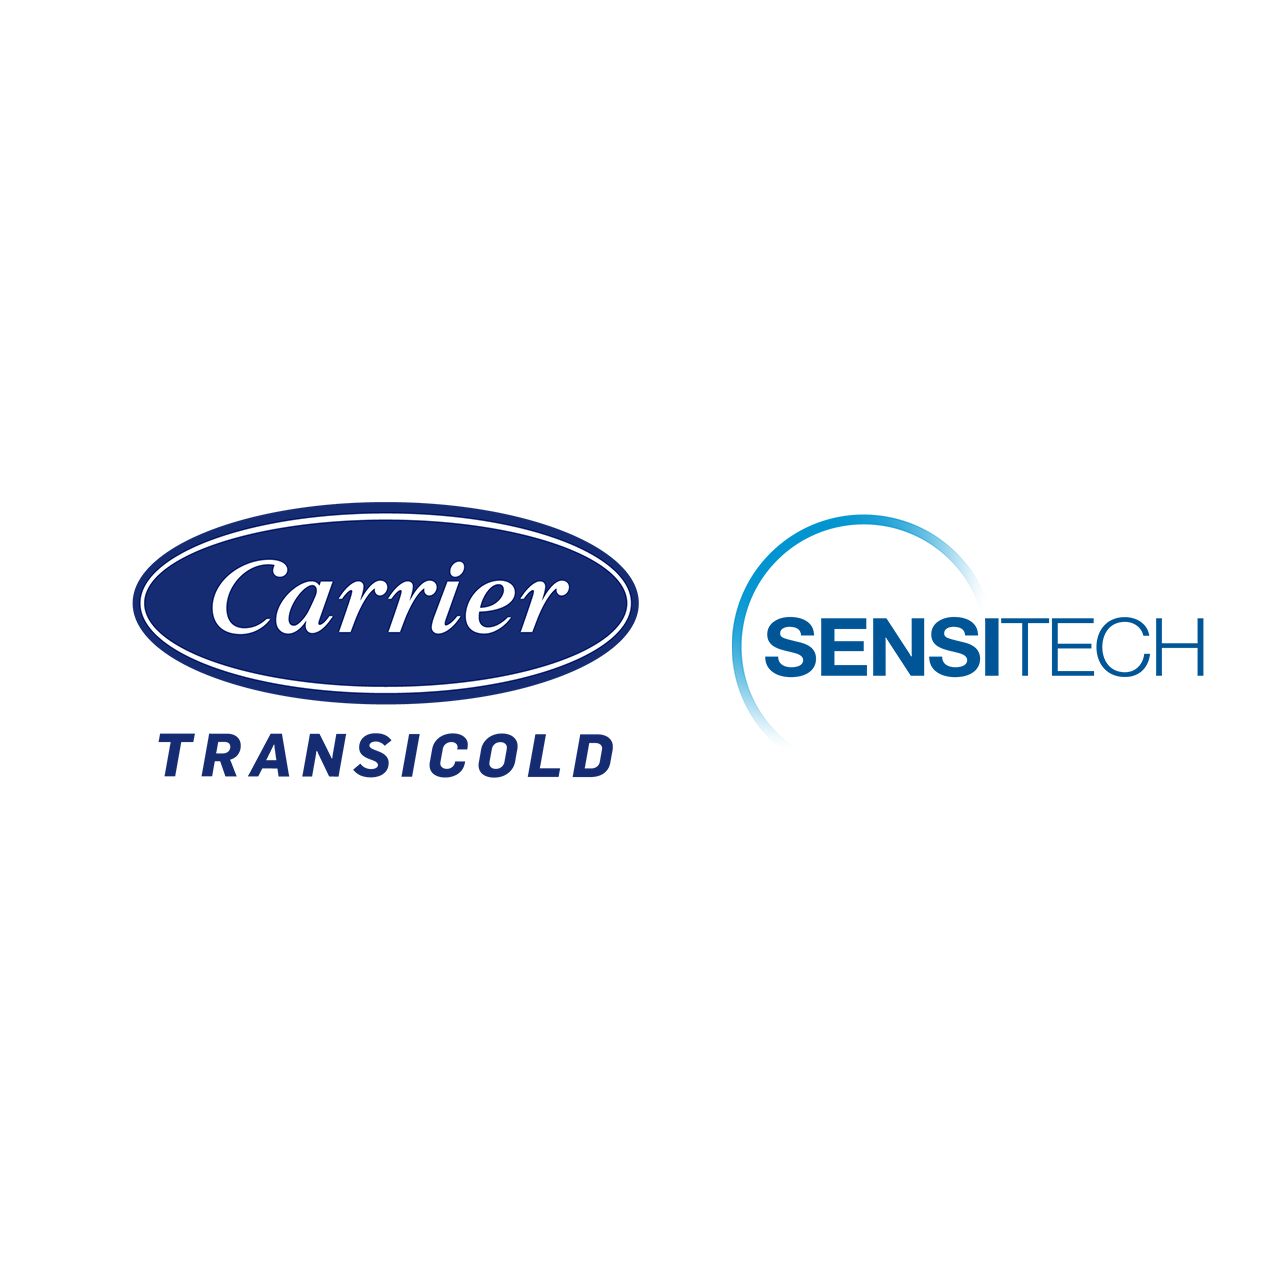 carrier-transicold-mobile-storage